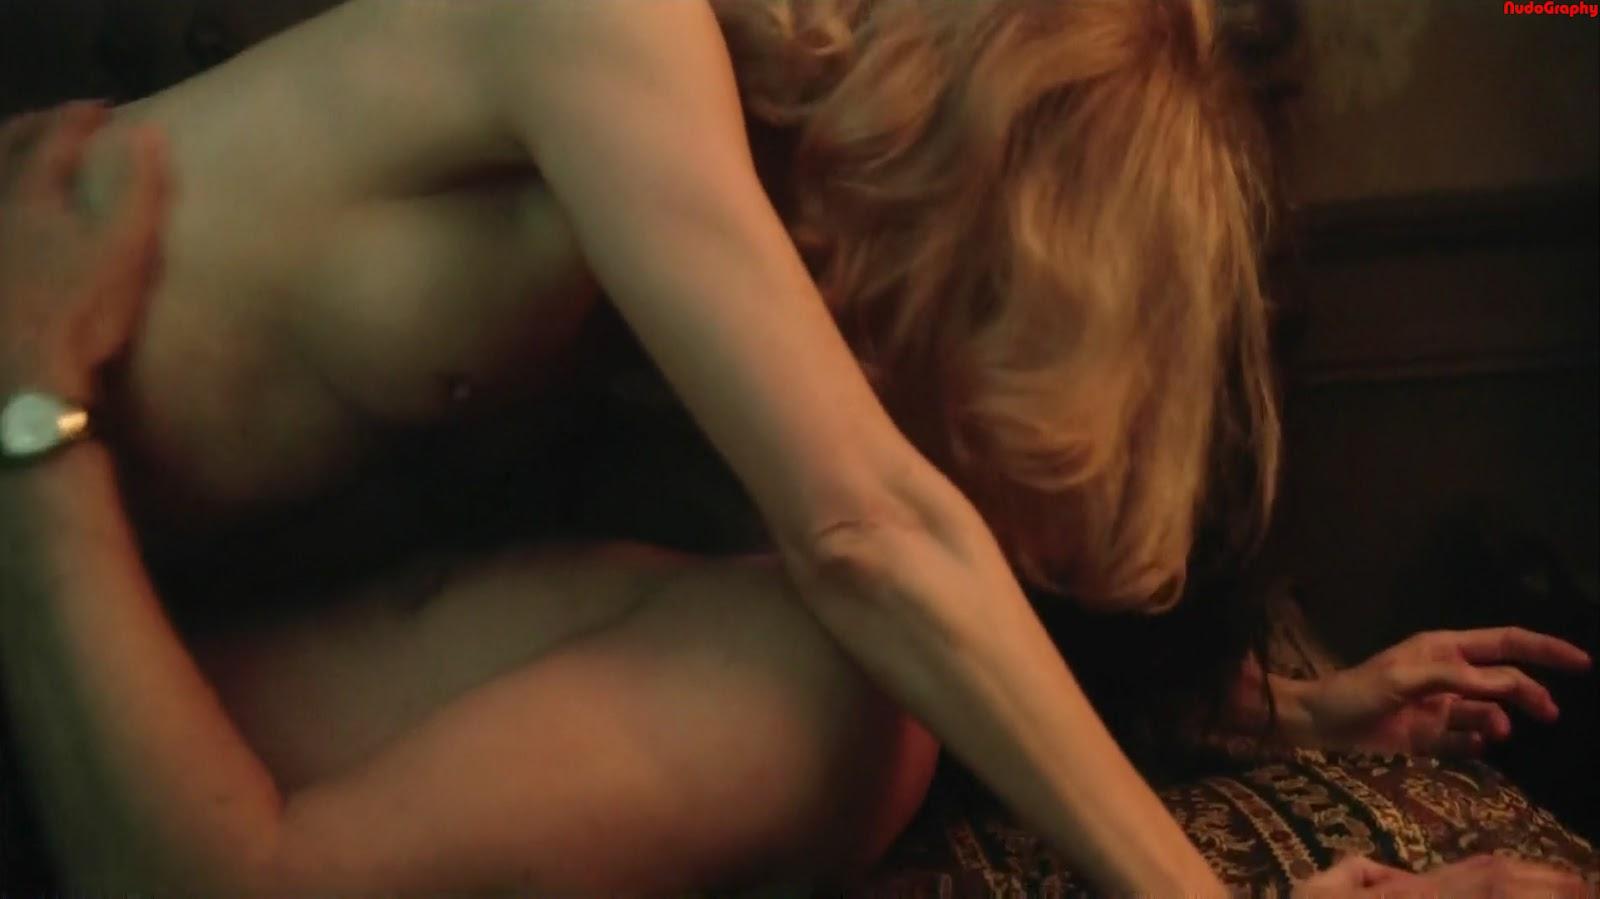 clive owen scene sex still